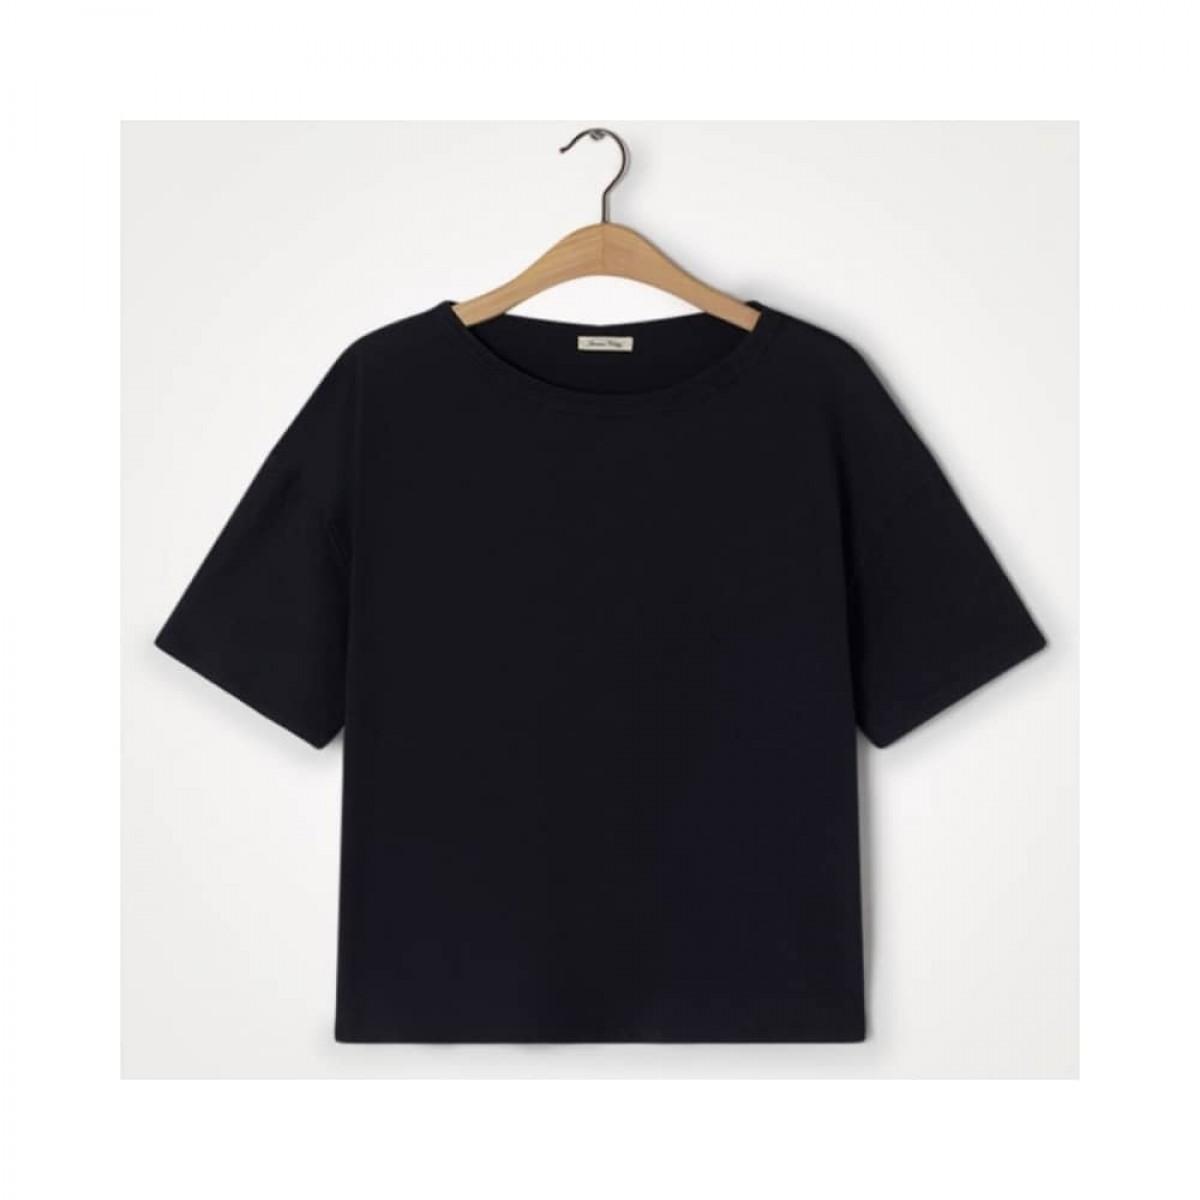 aksun t-shirt - vintage black